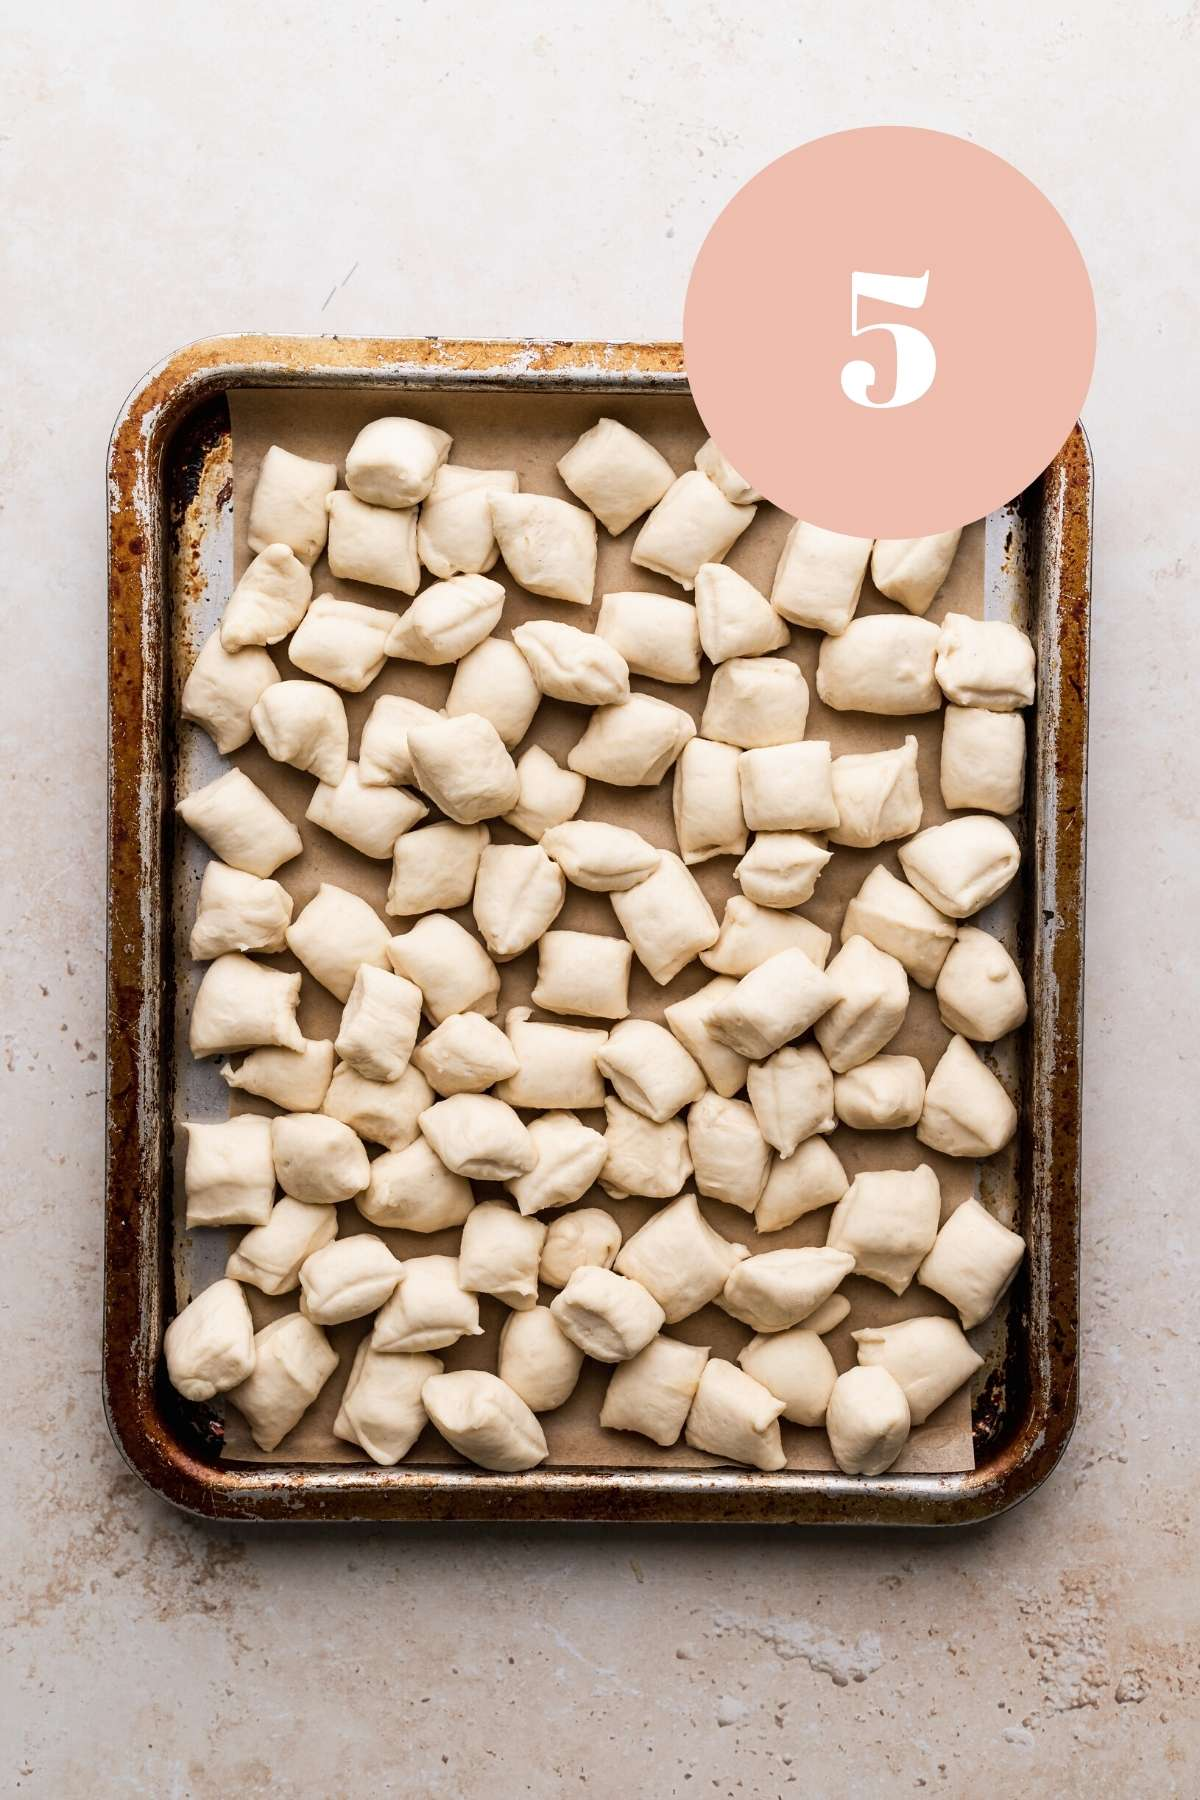 the parmesan bread bites on a pan.